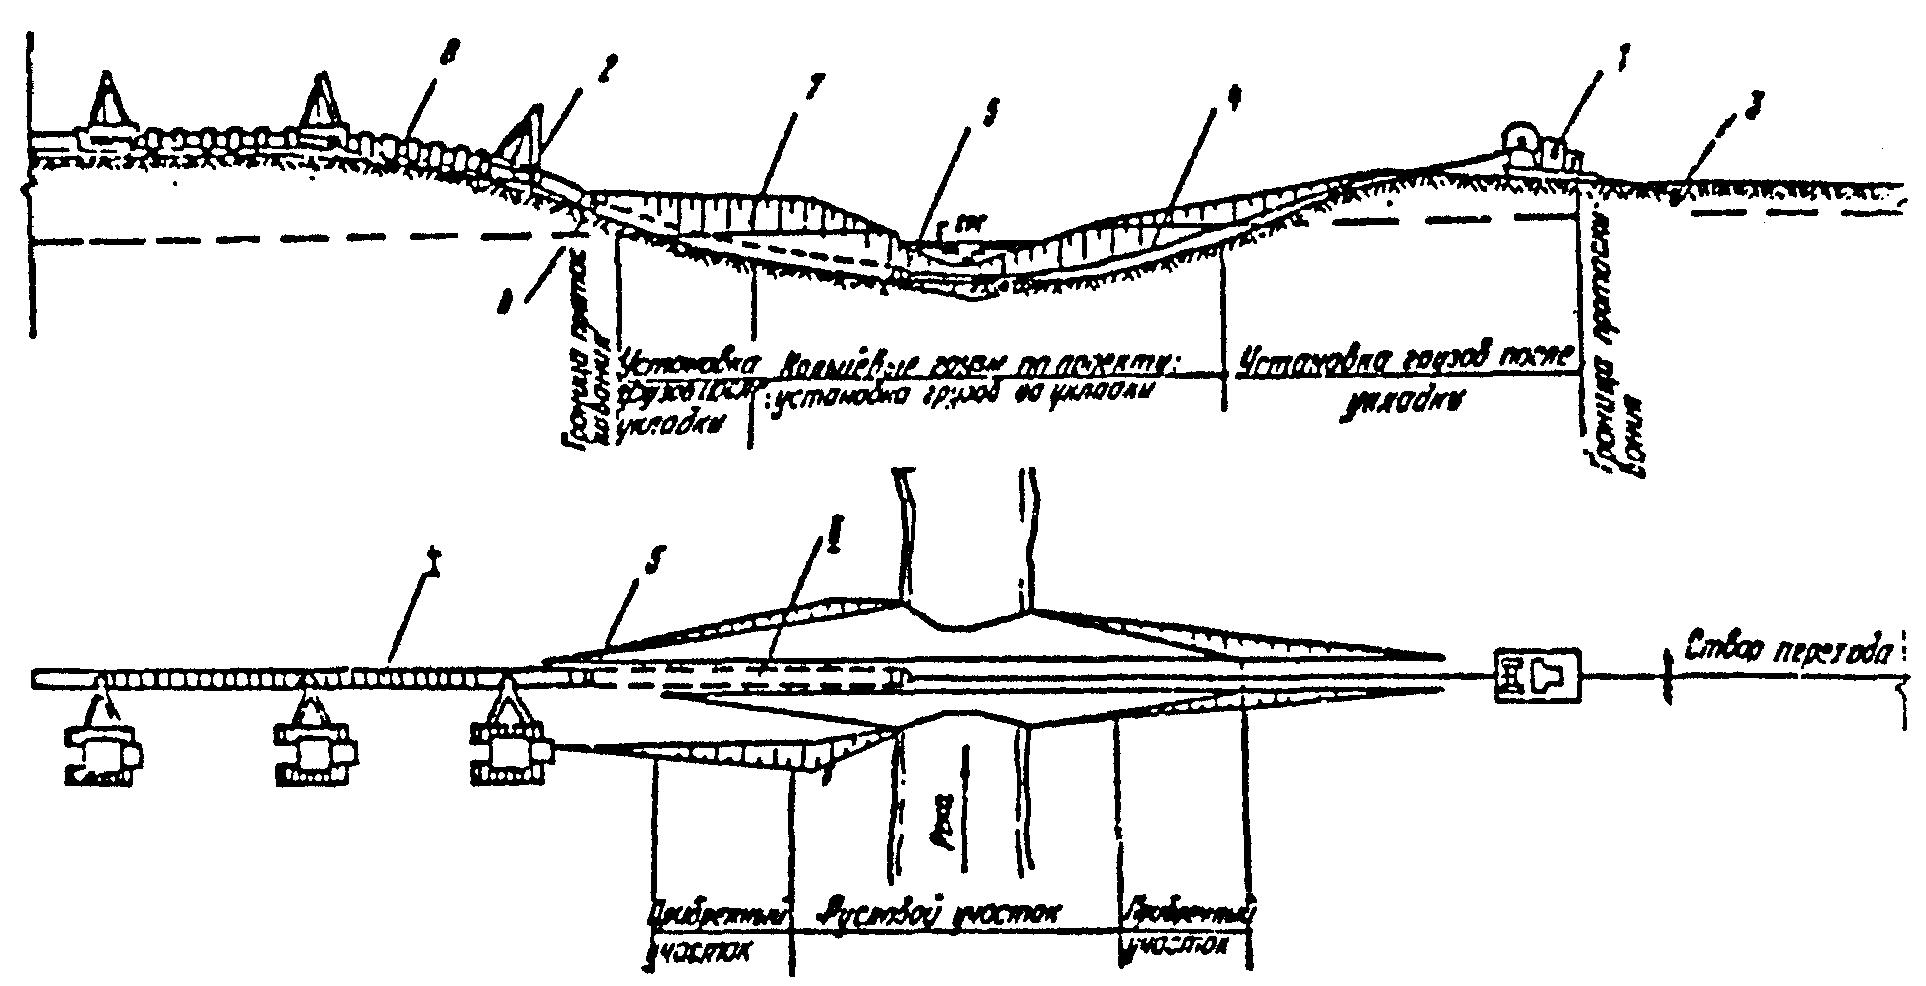 Прокладка канализации: правила укладки труб в земле - гидканал